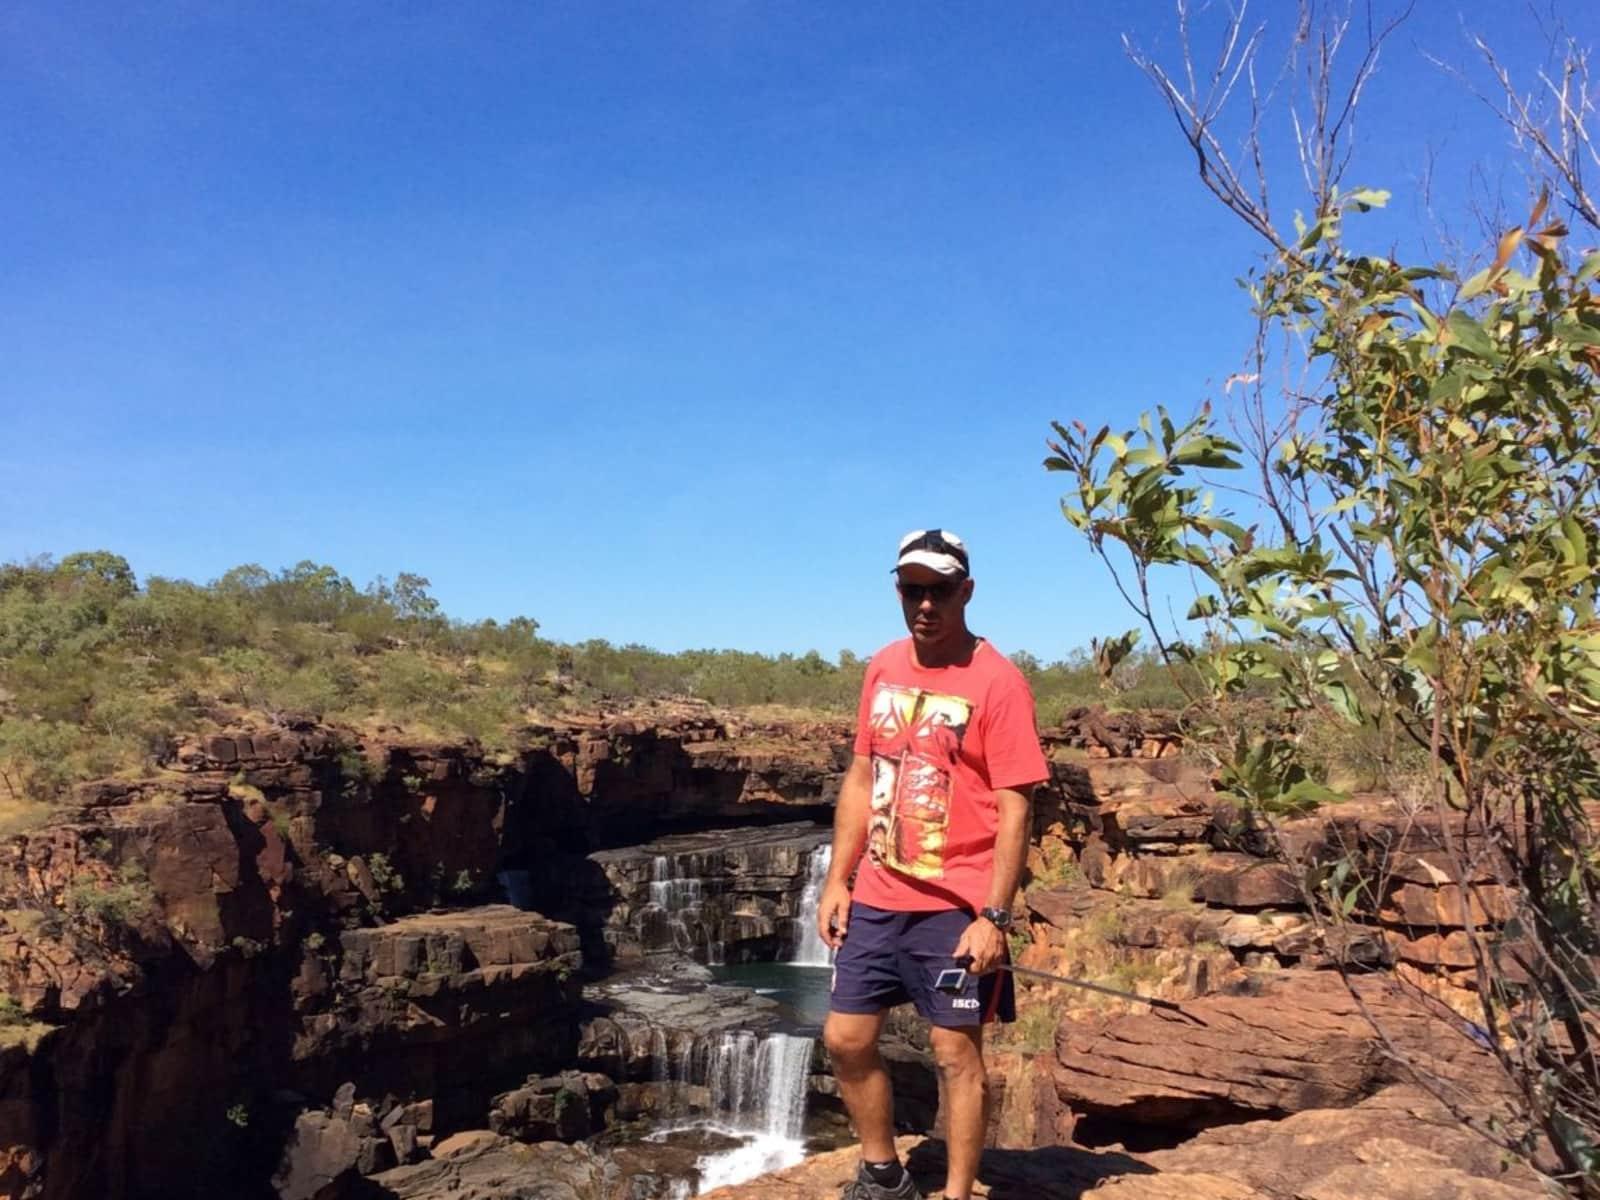 Robert from Carnarvon, Western Australia, Australia